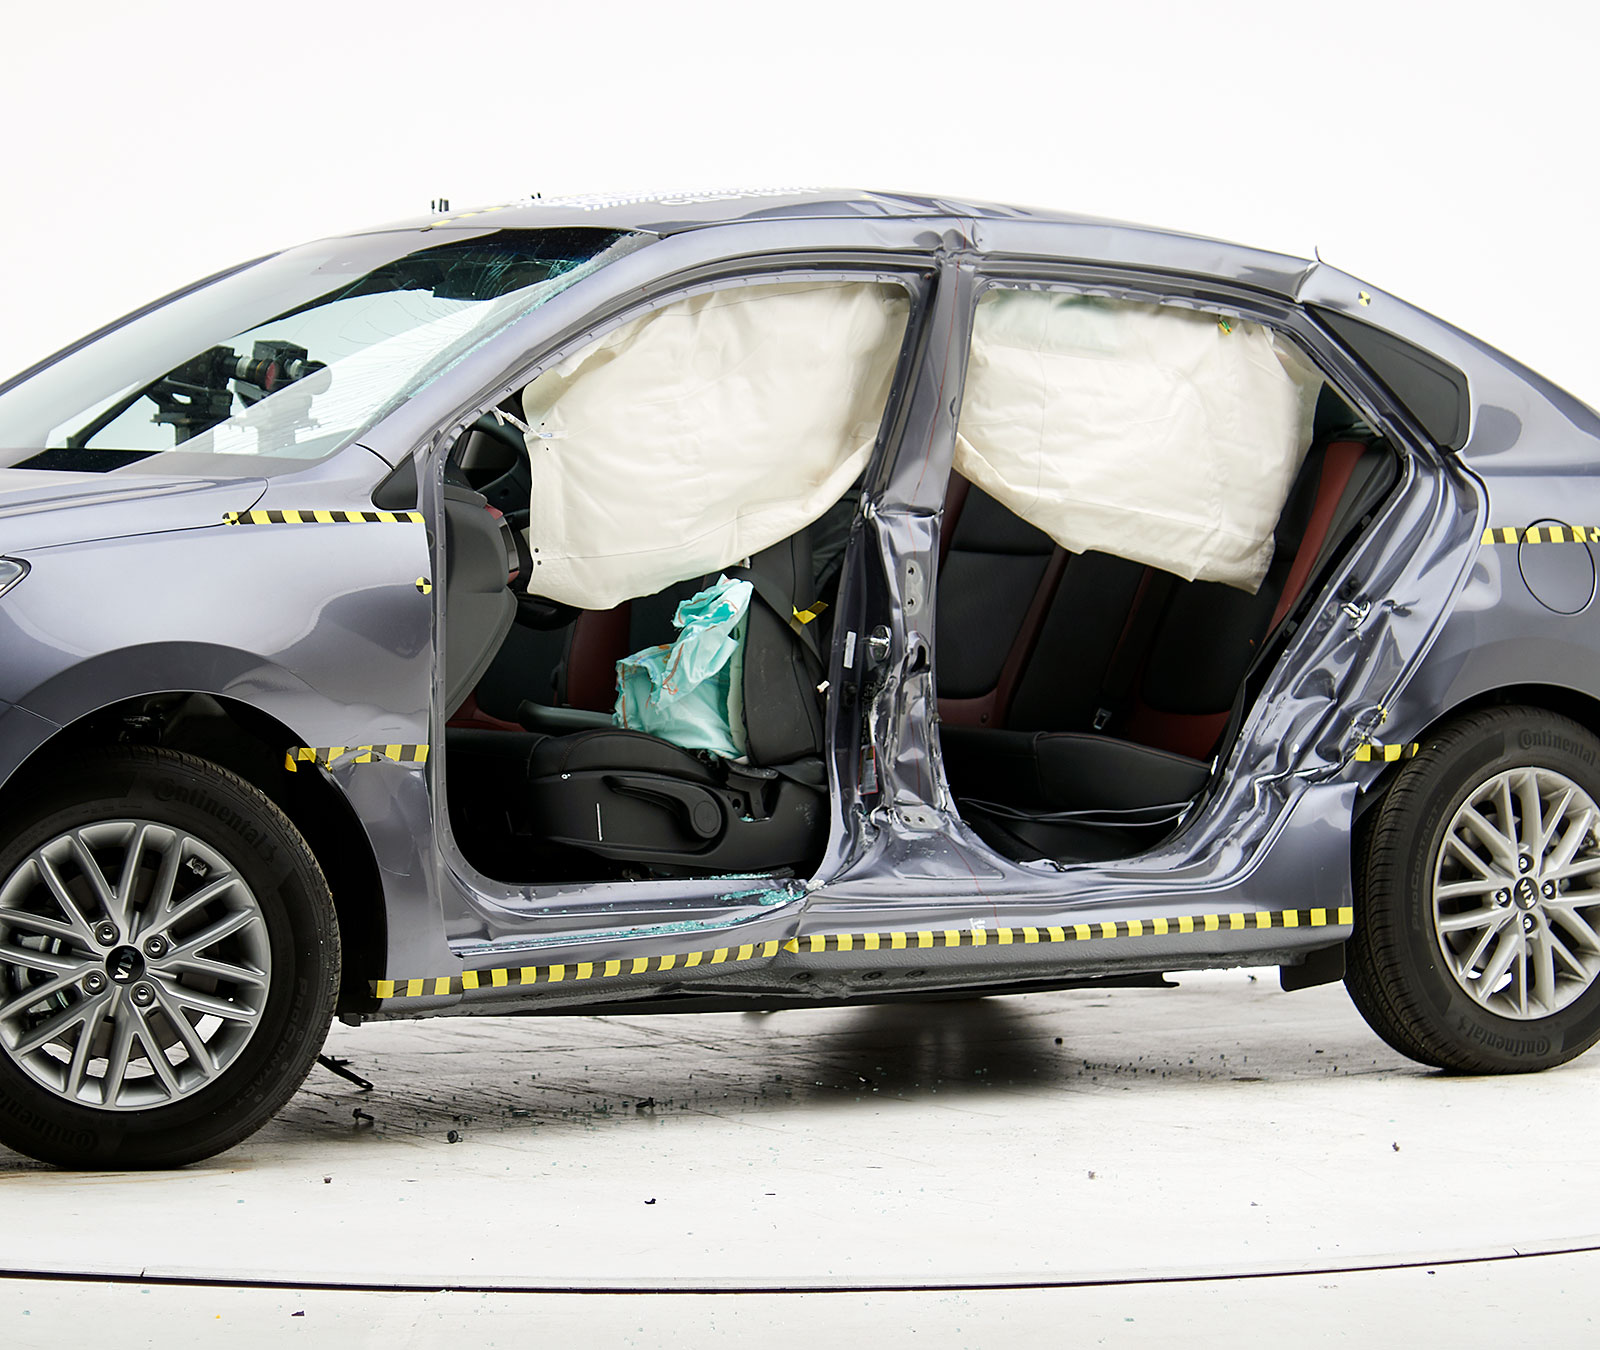 2019 Kia Rio Hatchback: 2019 Hyundai Accent